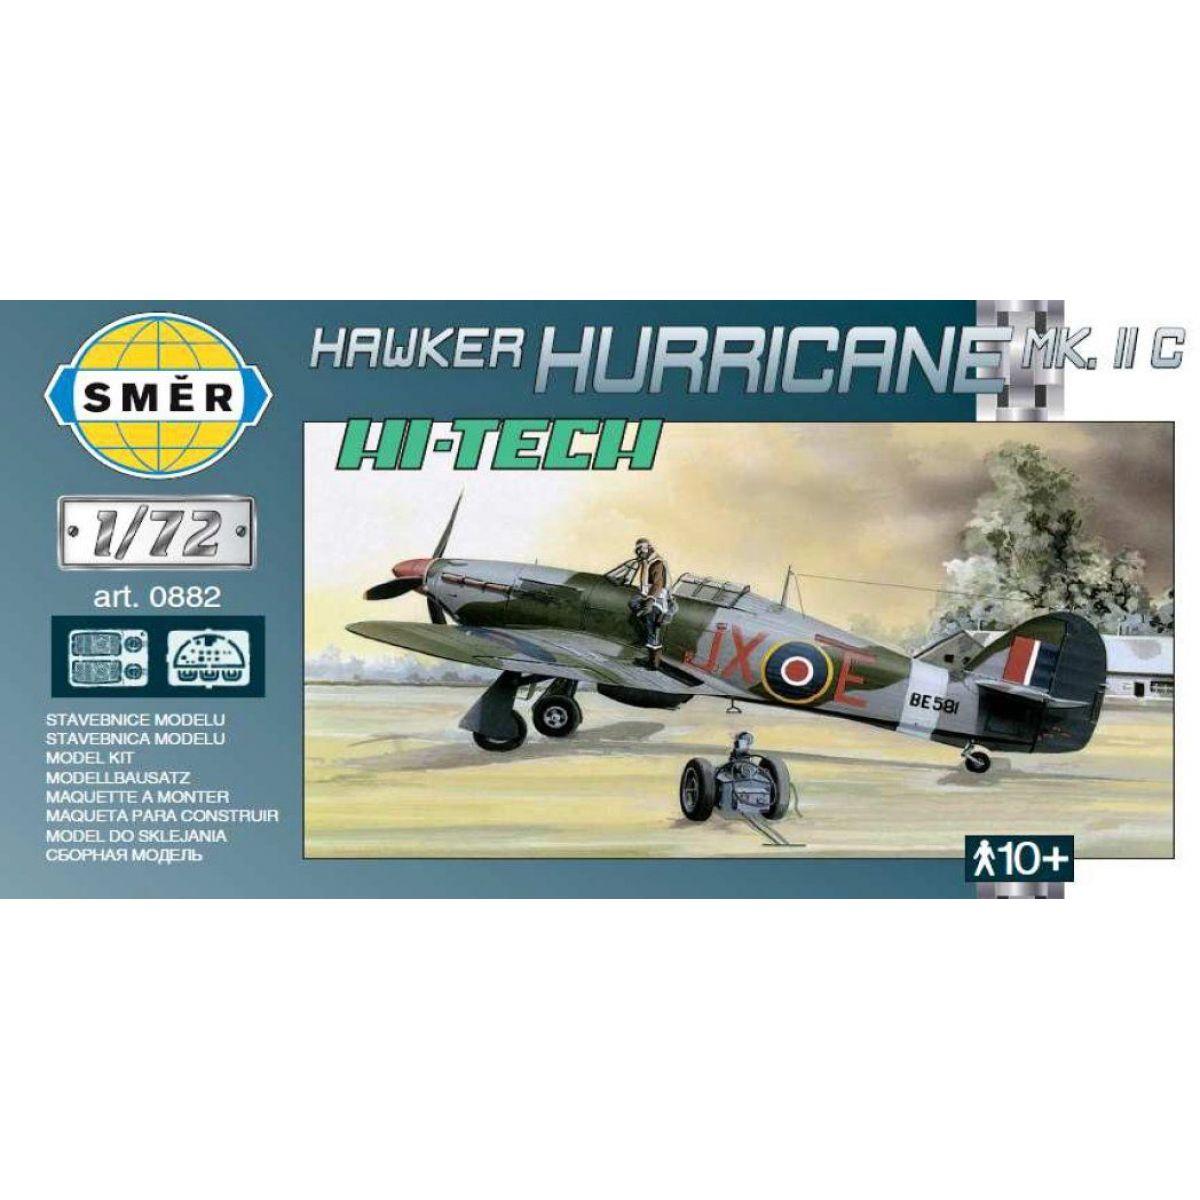 Směr Model Hawker Hurricane Mk.I HI TECH 1:72